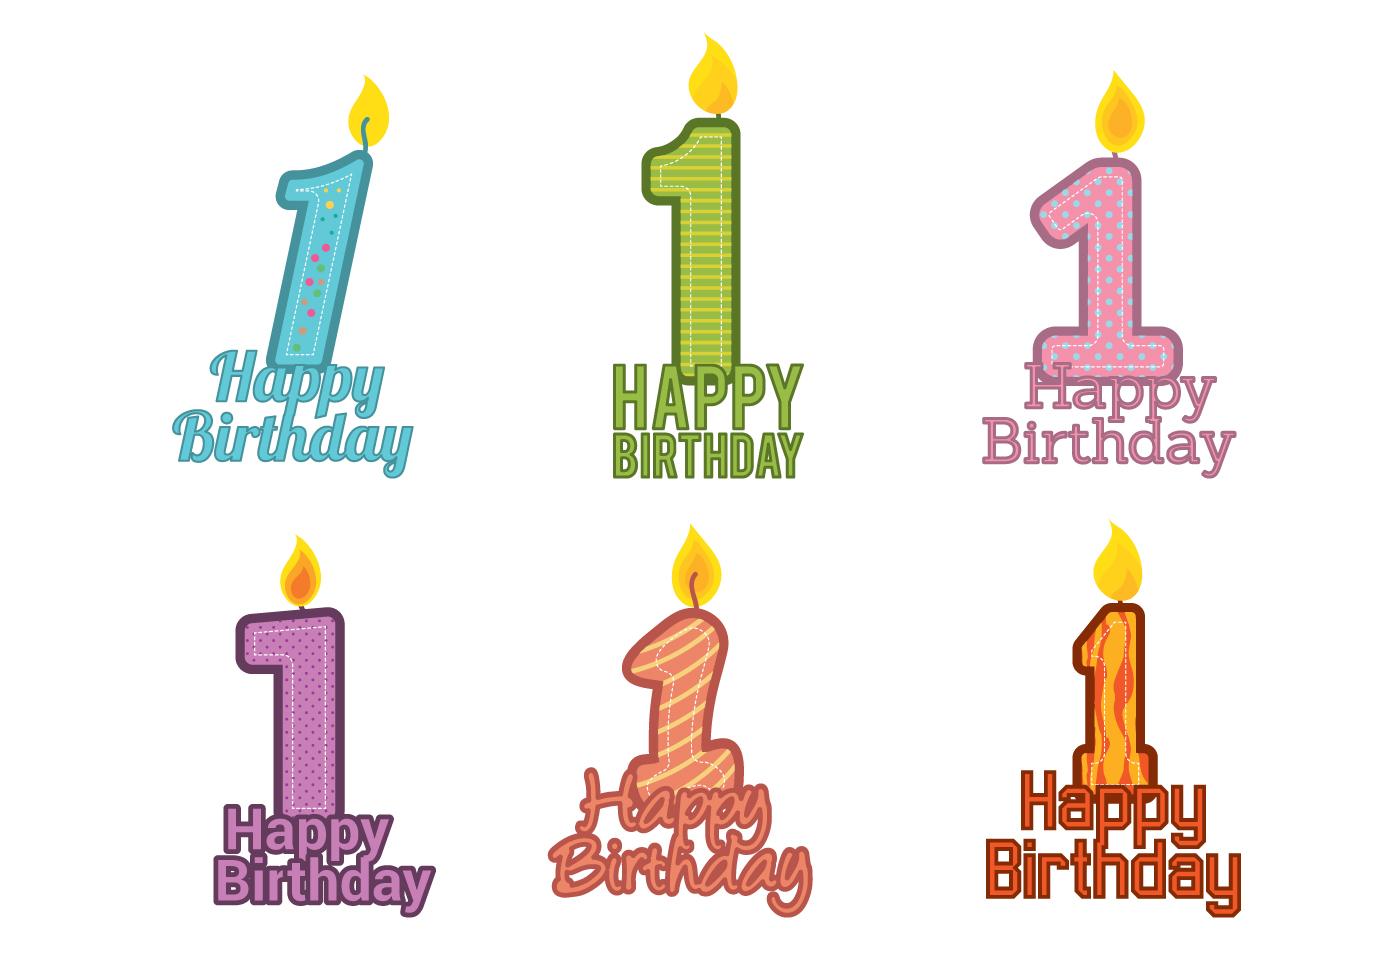 1st Birthday Vector - Download Free Vector Art, Stock ...